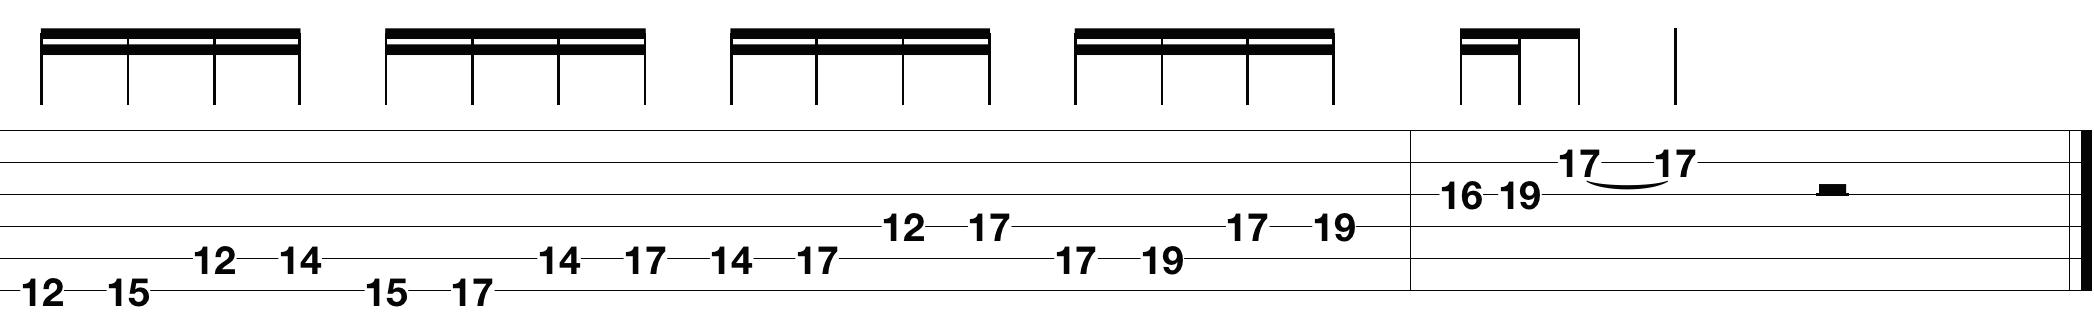 shred-guitars_3.png